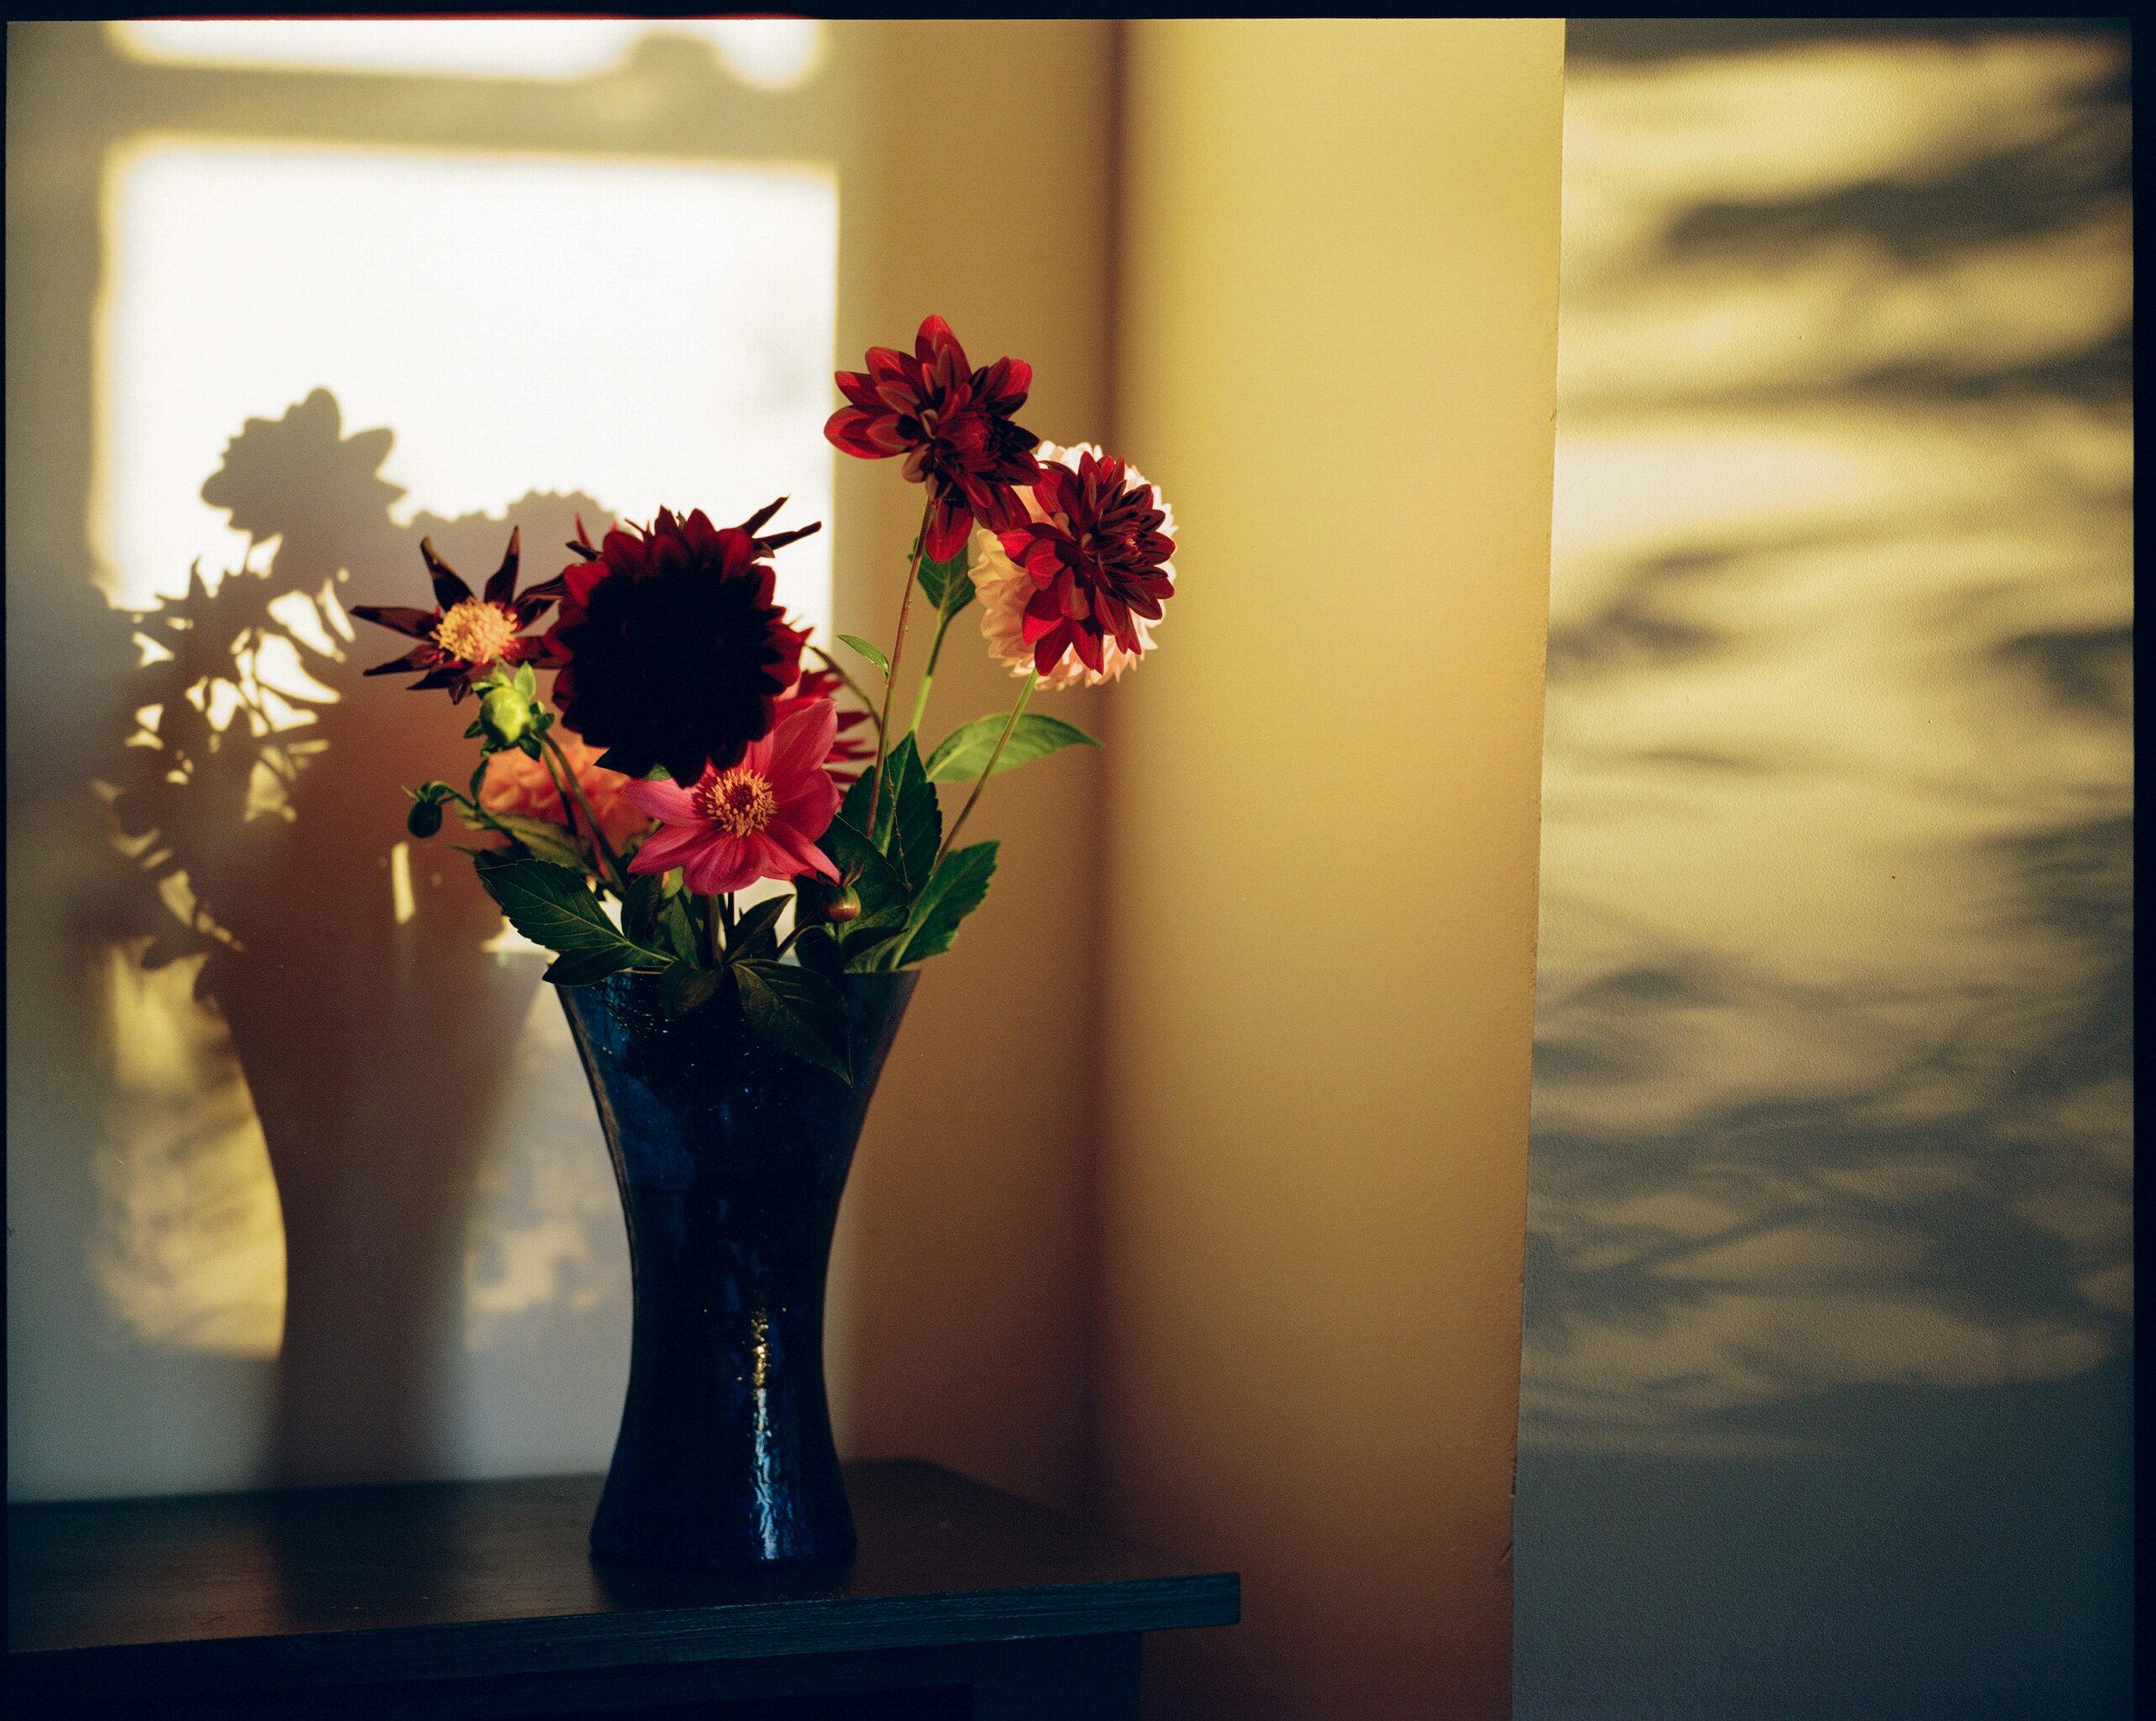 Flowers and light06.jpg